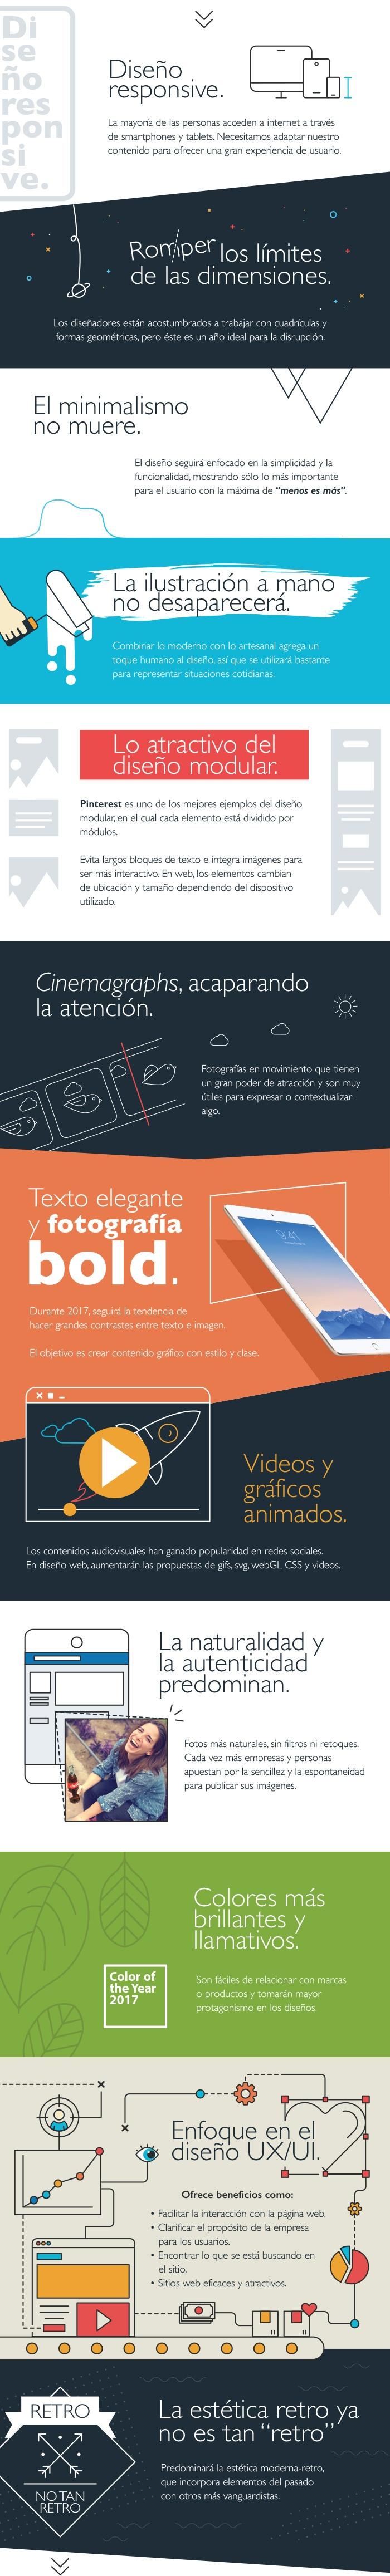 Infografia-ultimas-tendencias-diseno-grafico-2017-cliento-marketing-digital.jpg